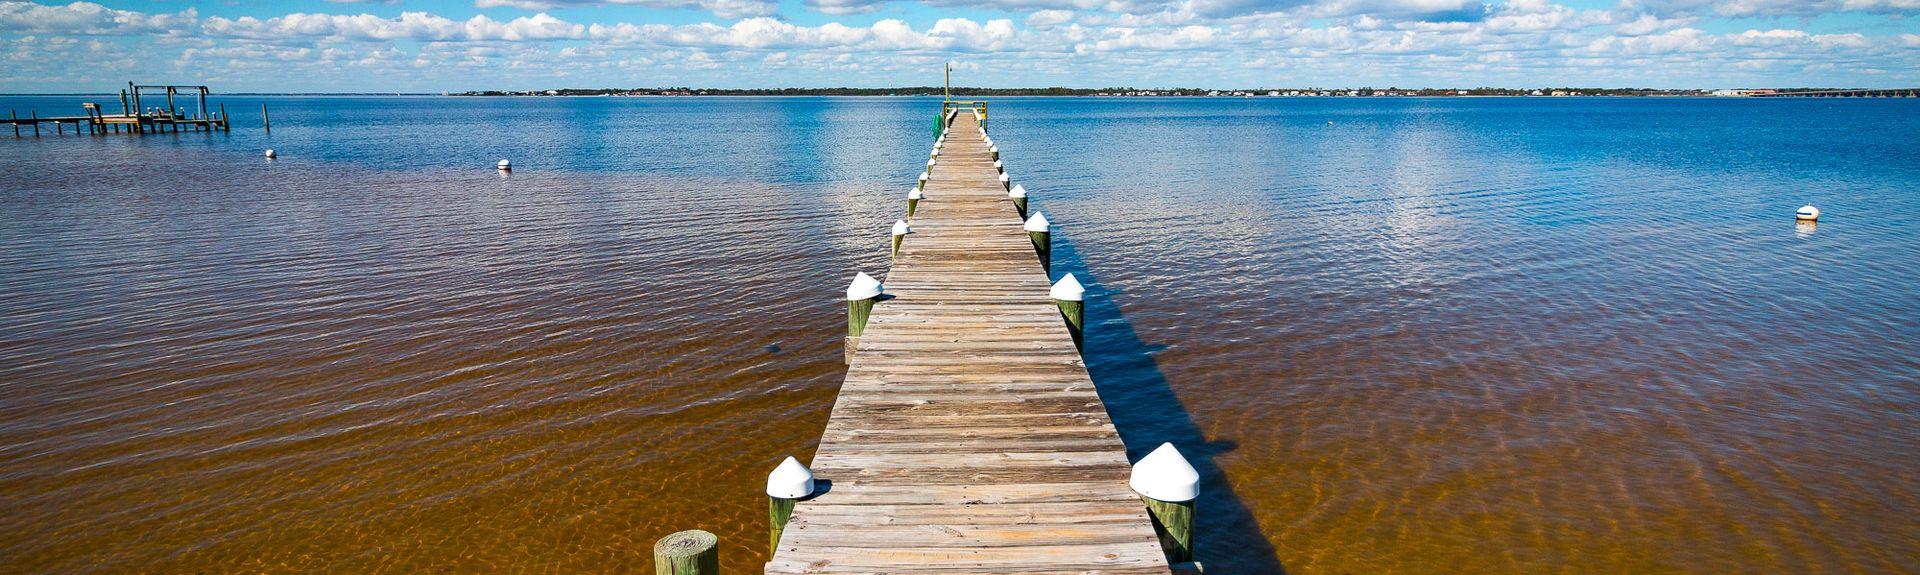 Santa Rosa Dunes (Pensacola Beach, Florida, Stati Uniti d'America)